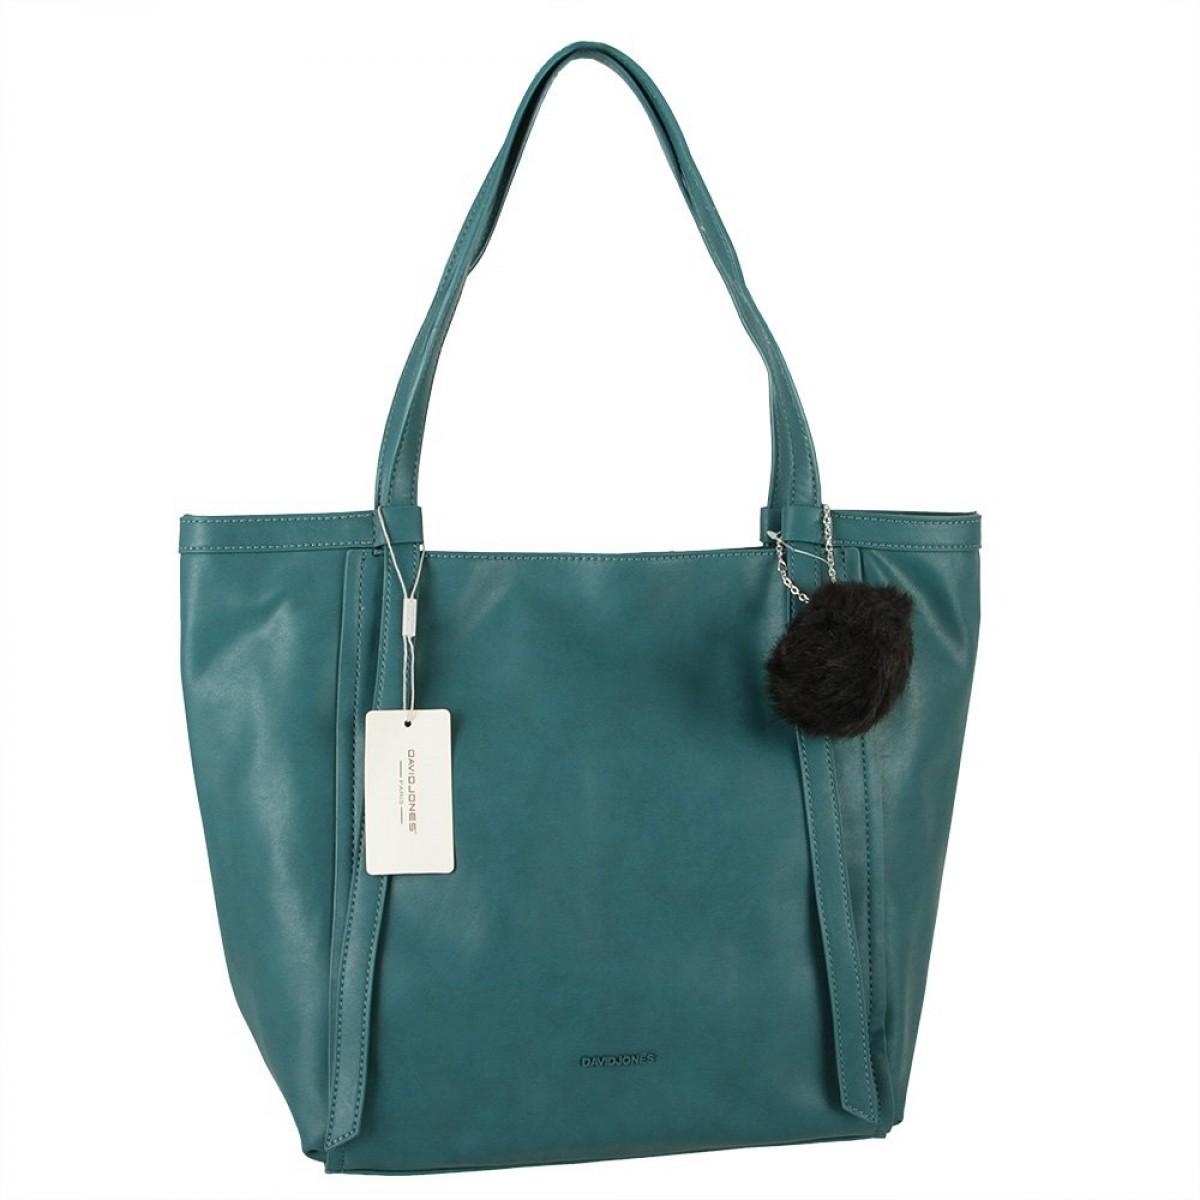 Жіноча сумка David Jones CM5856 PEACOCK BLUE